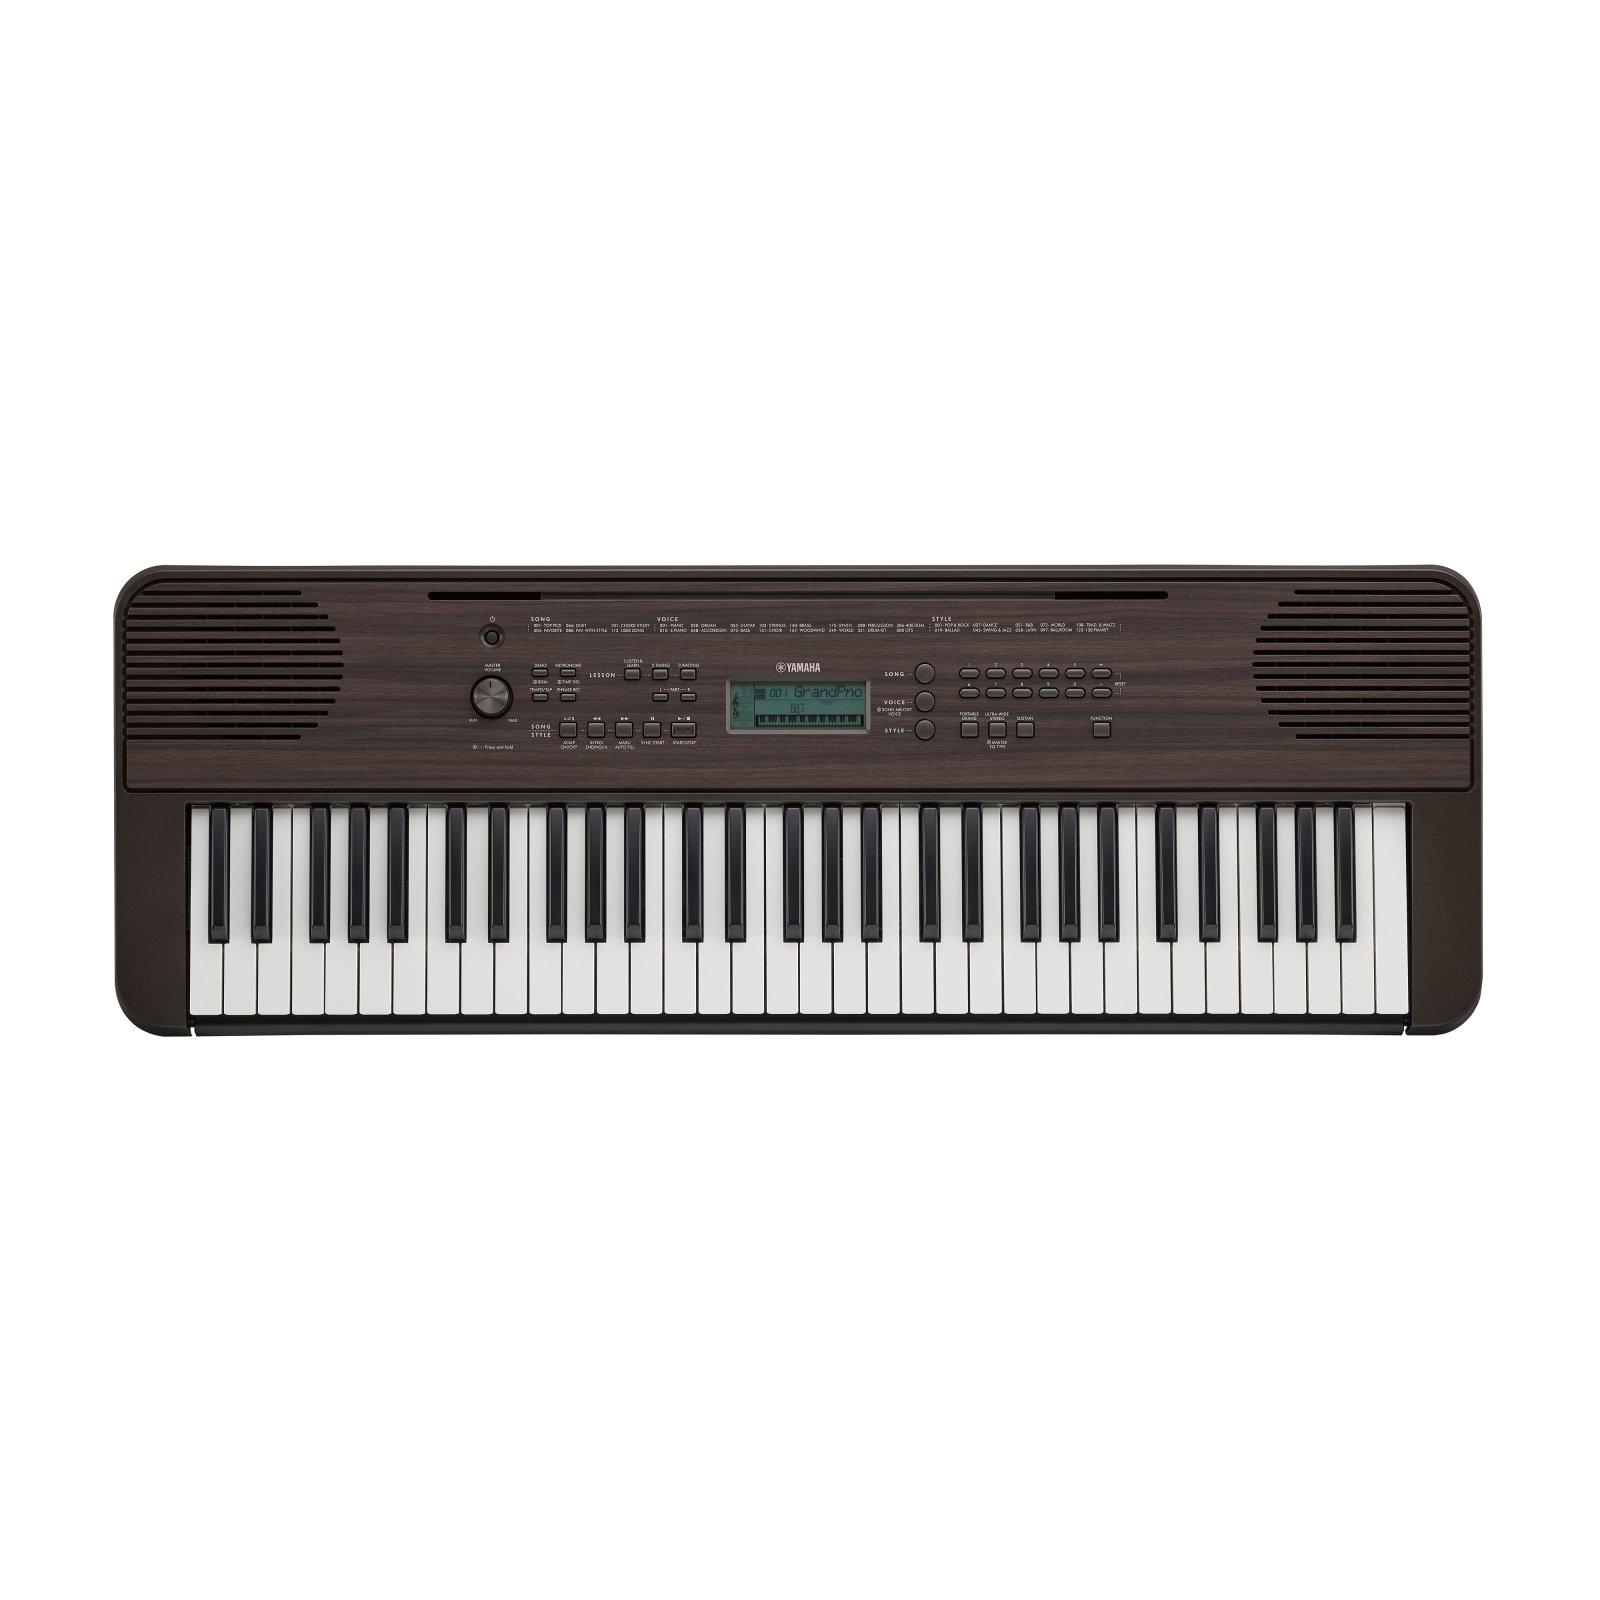 Yamaha PSR-E360DW 61-key Touch Sensitive Portable Keyboard